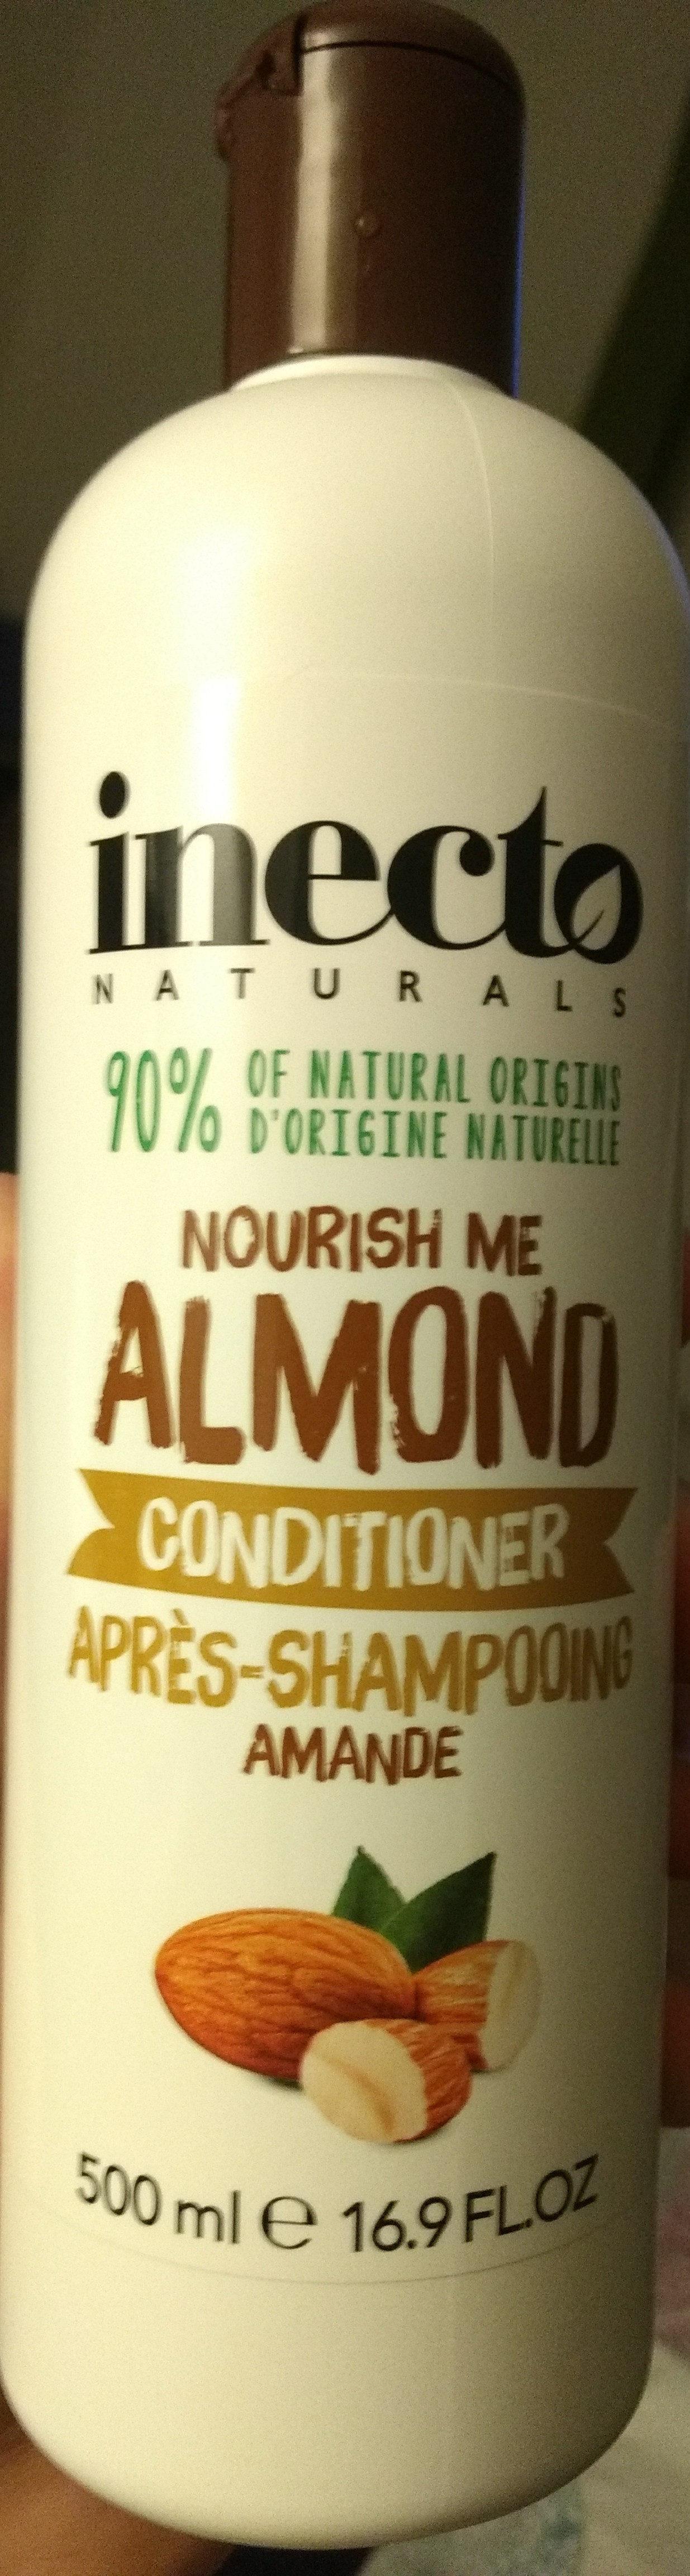 Nourish Me Almond Conditioner - Product - en